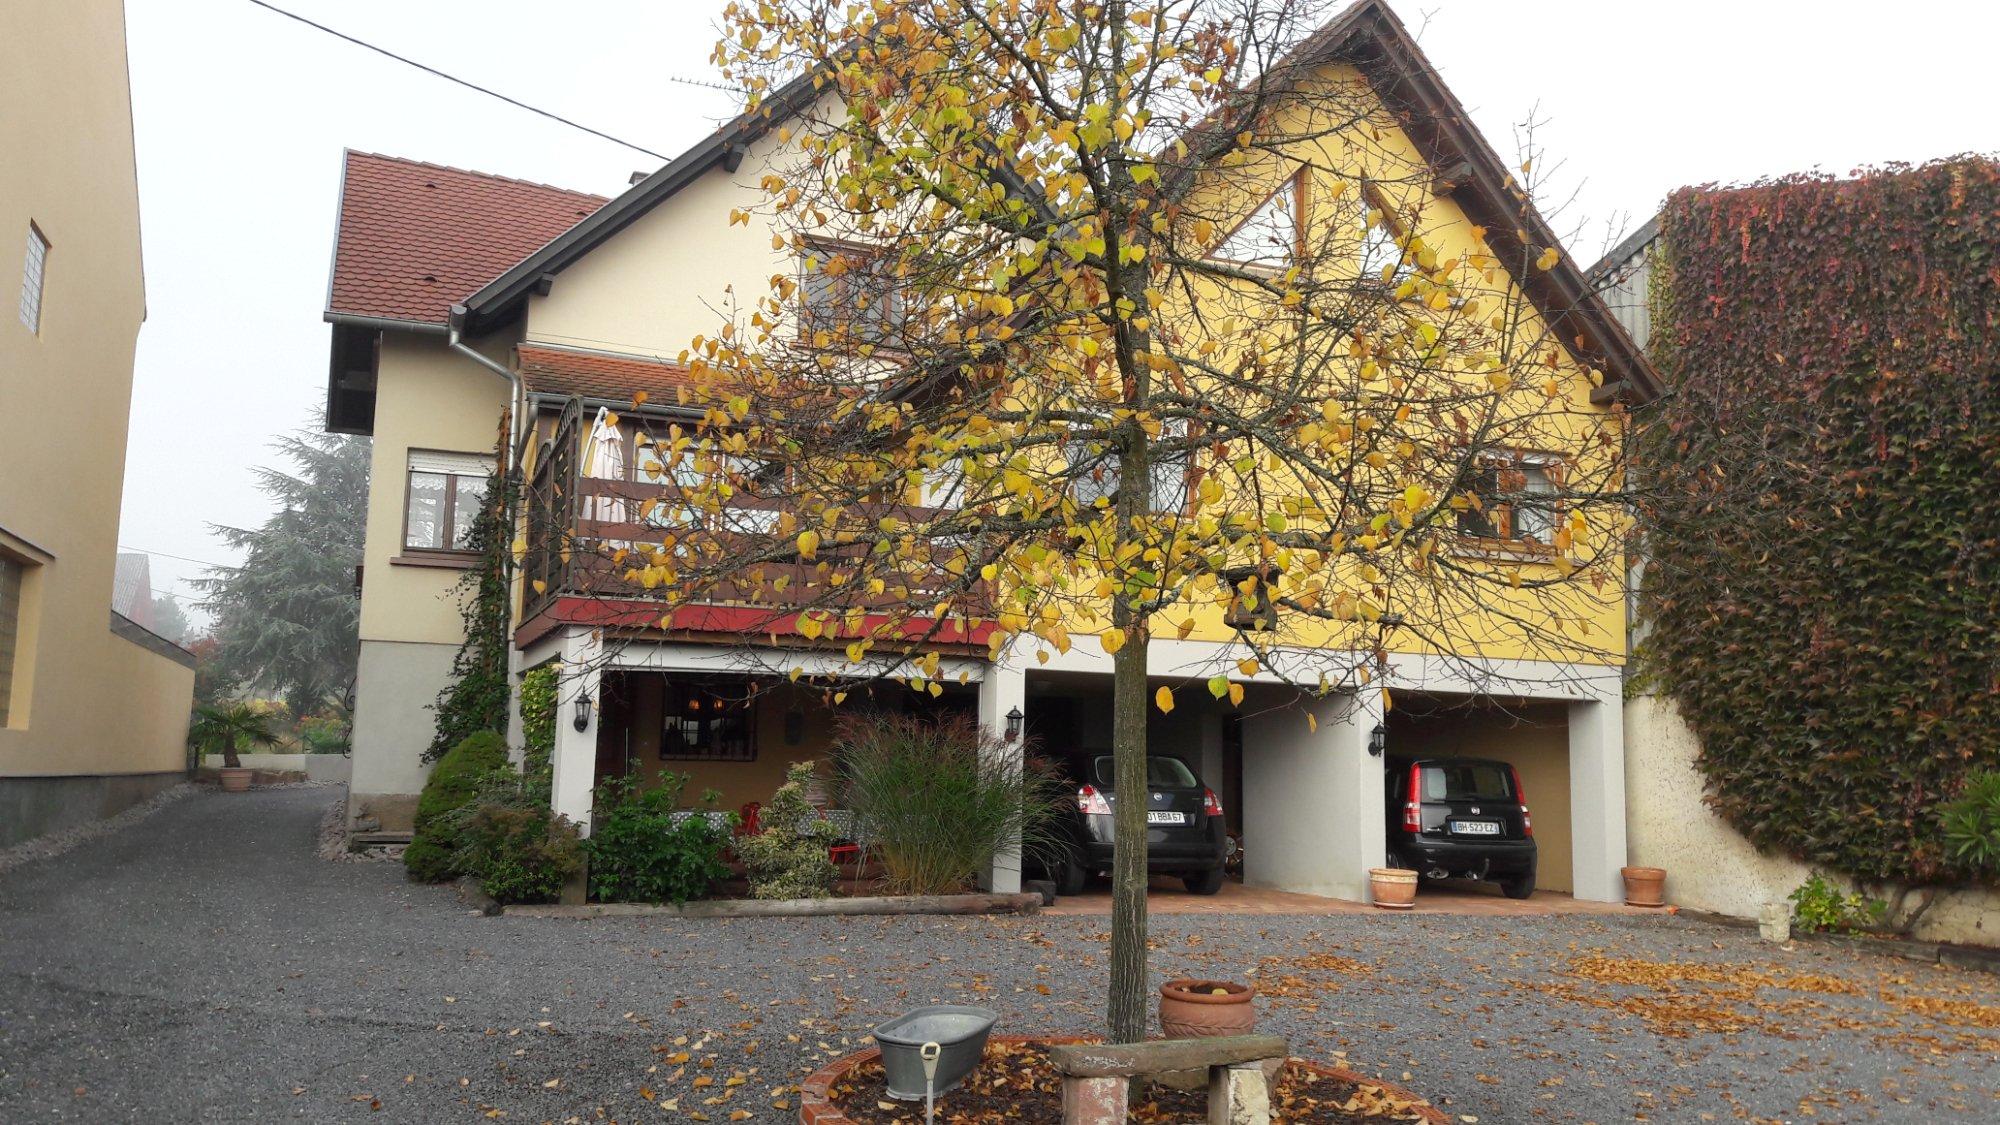 Chambre d'hotes du Zellberg